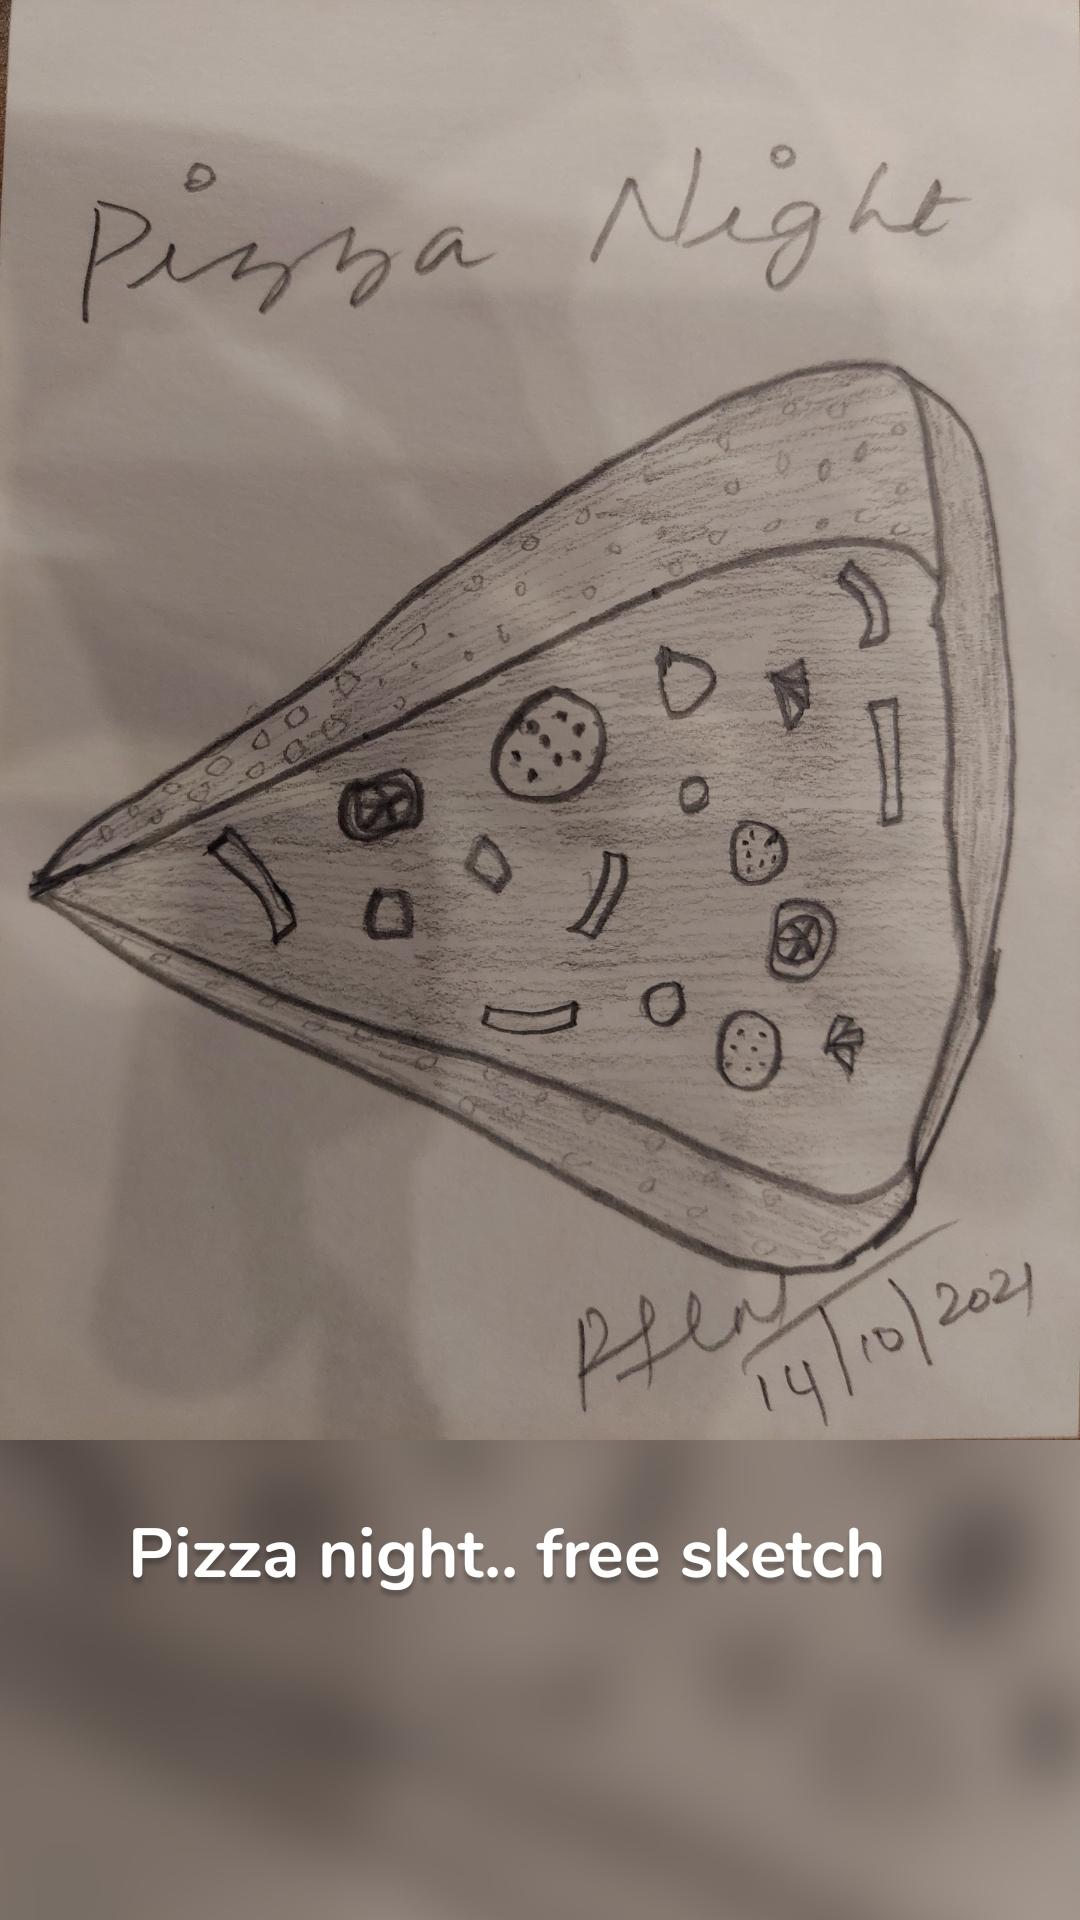 Pizza night.. free sketch